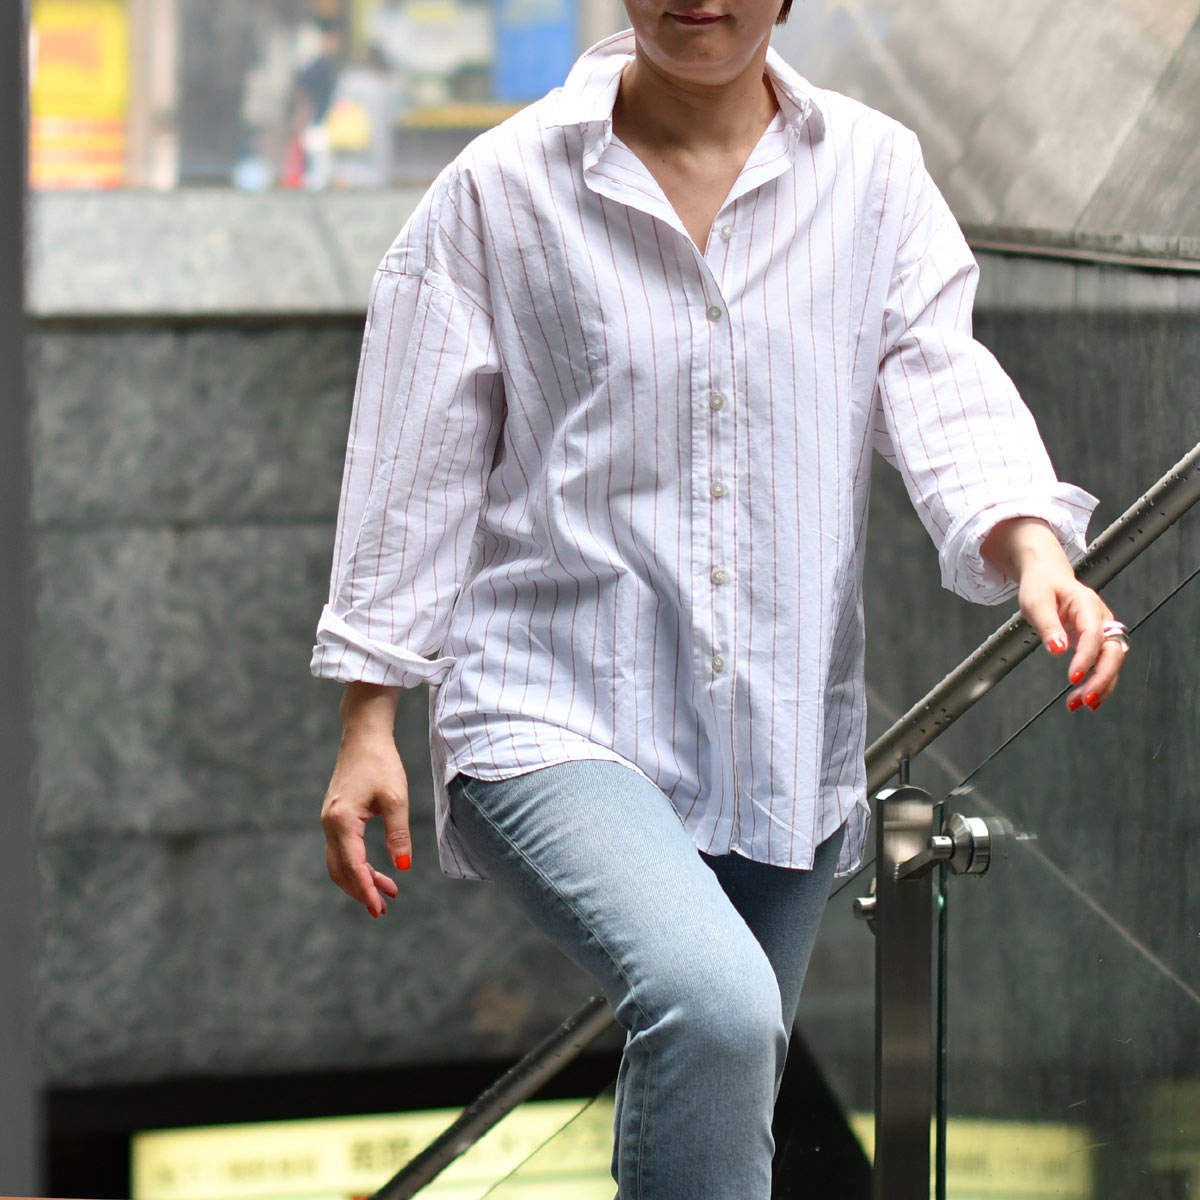 Finamore【フィナモレ】ストライプ ビッグシルエットシャツ